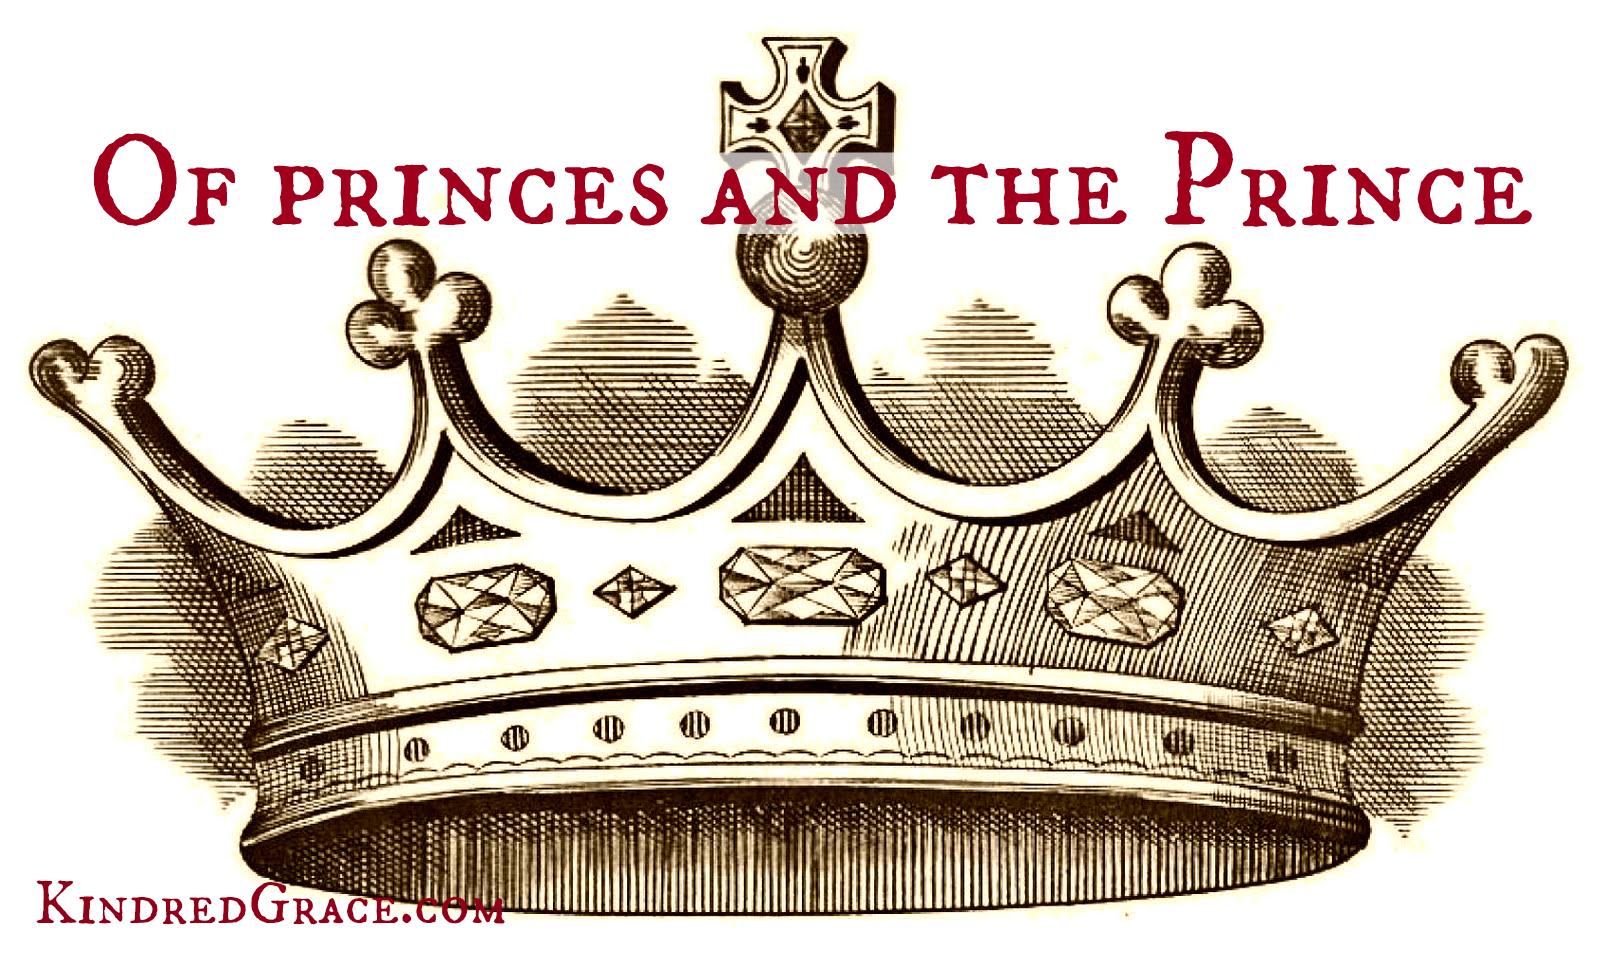 Of princes and the Prince